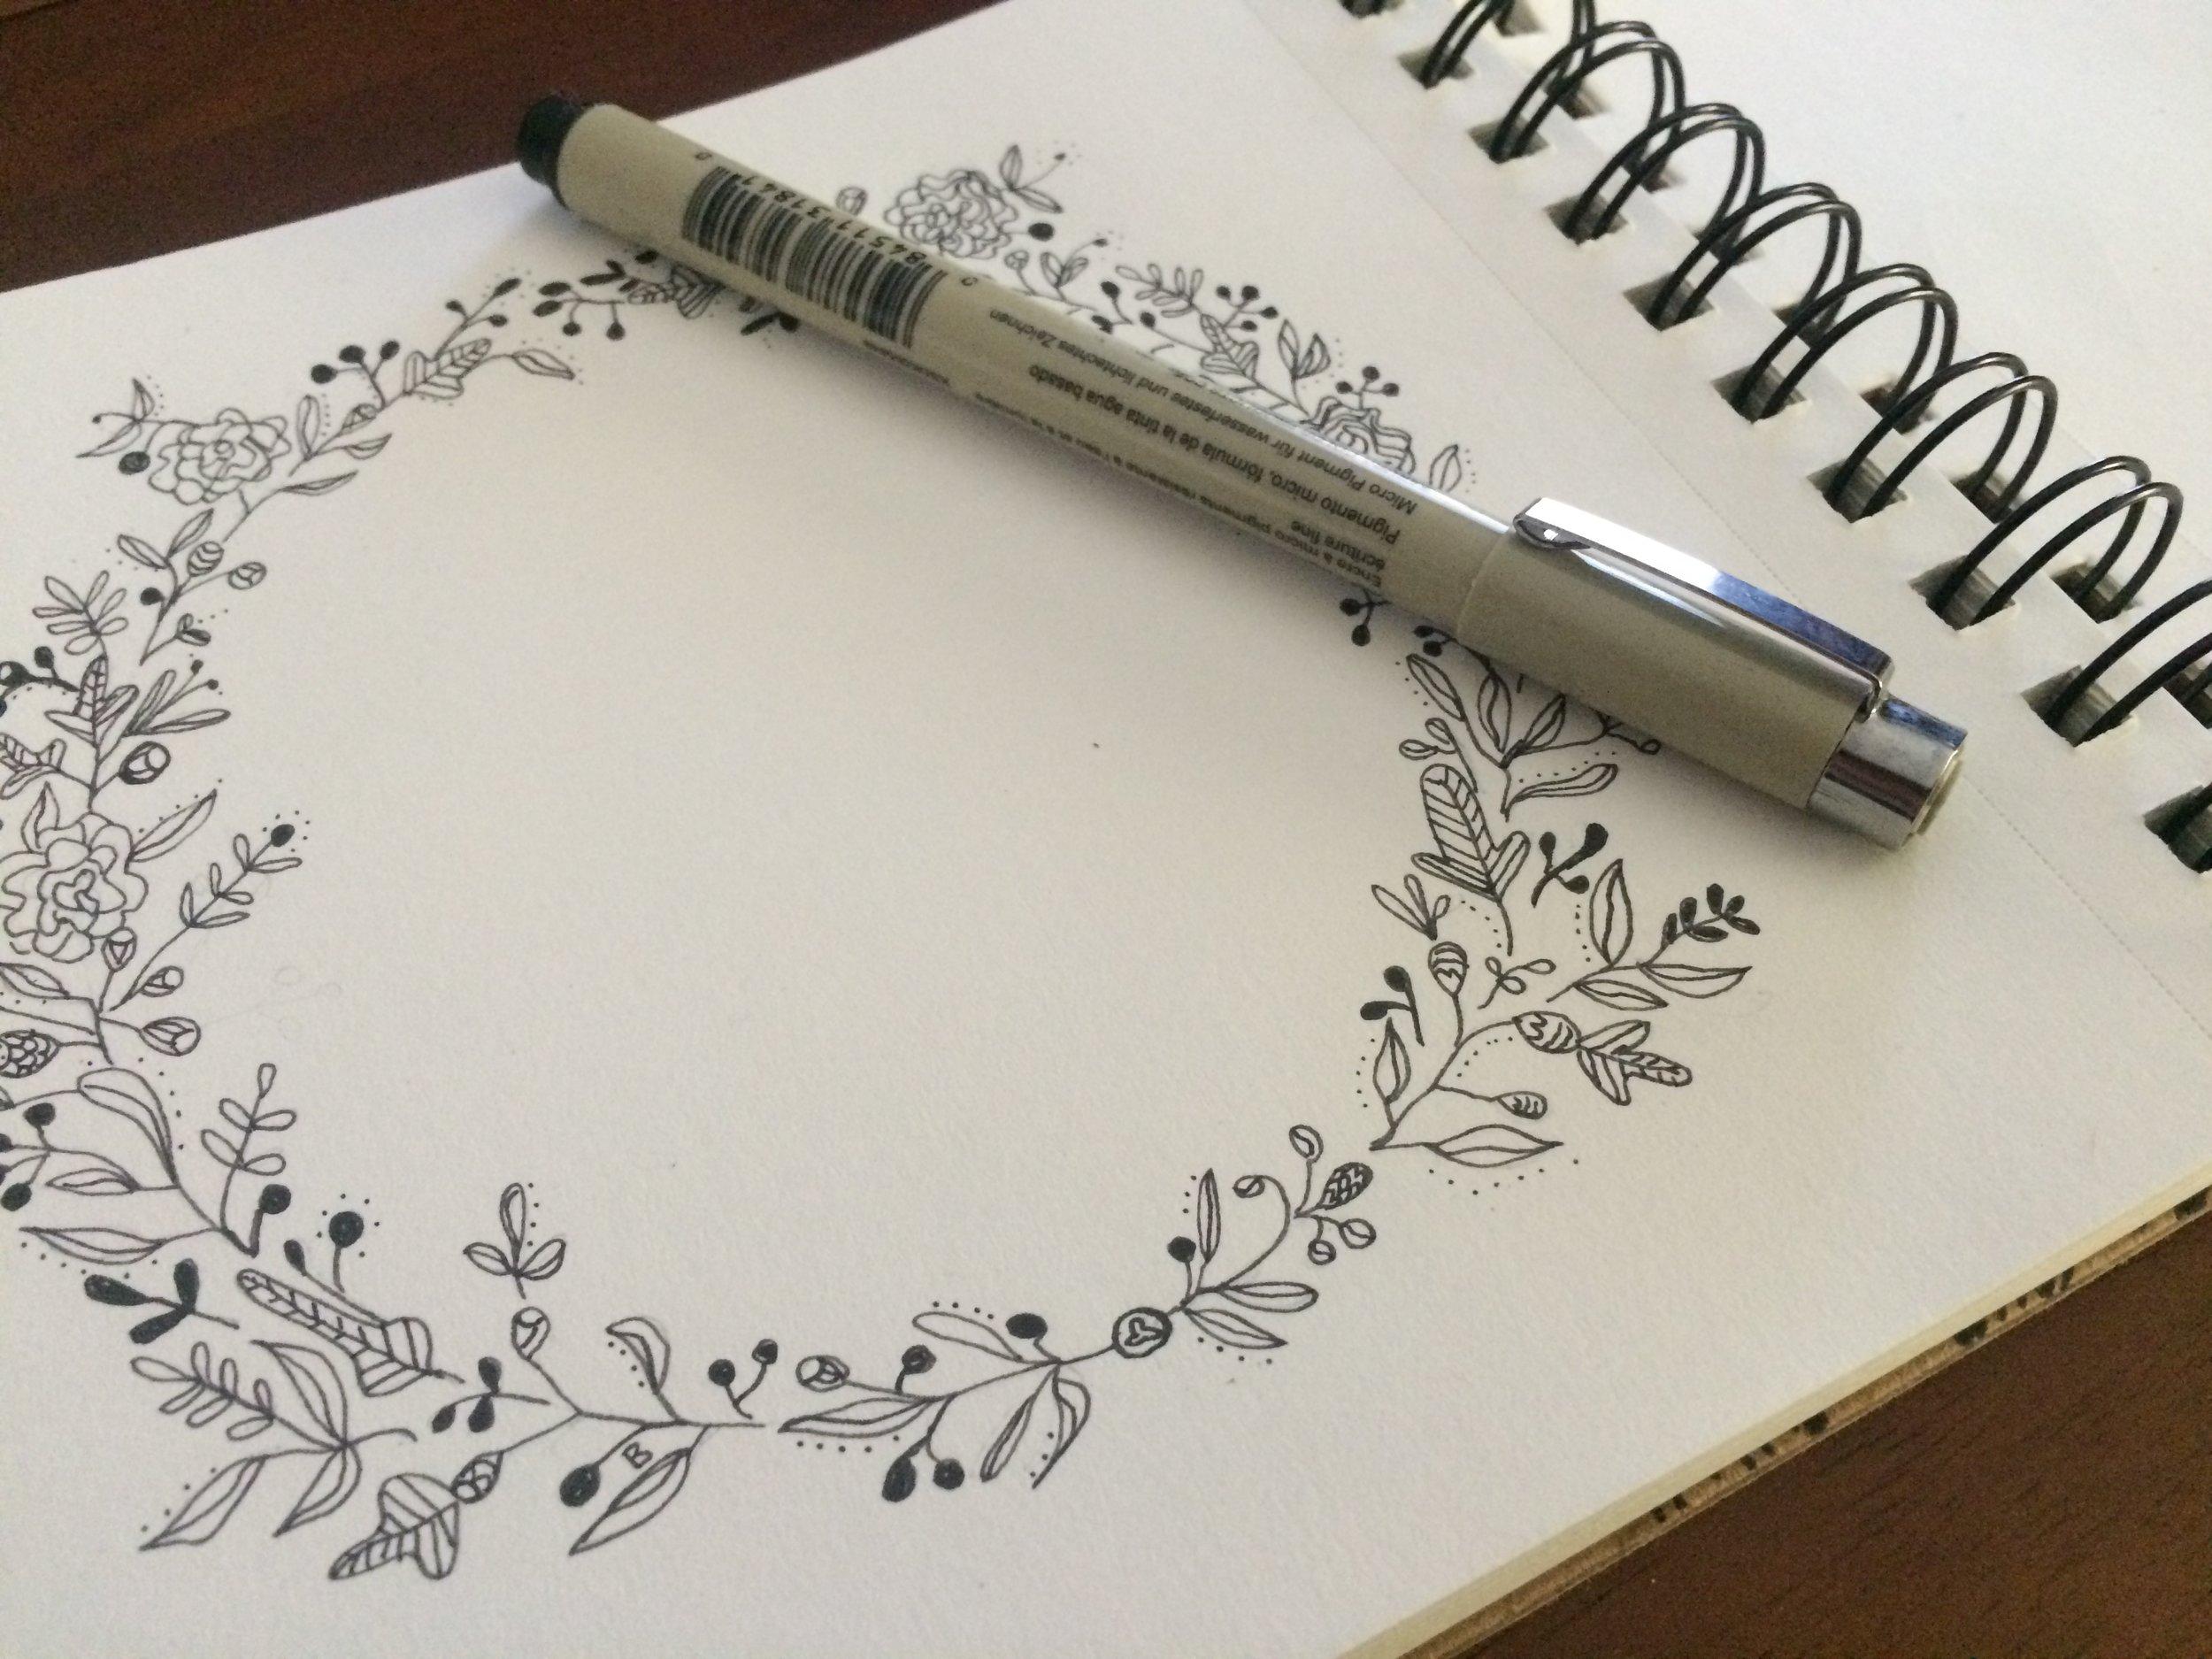 Doodle wreath